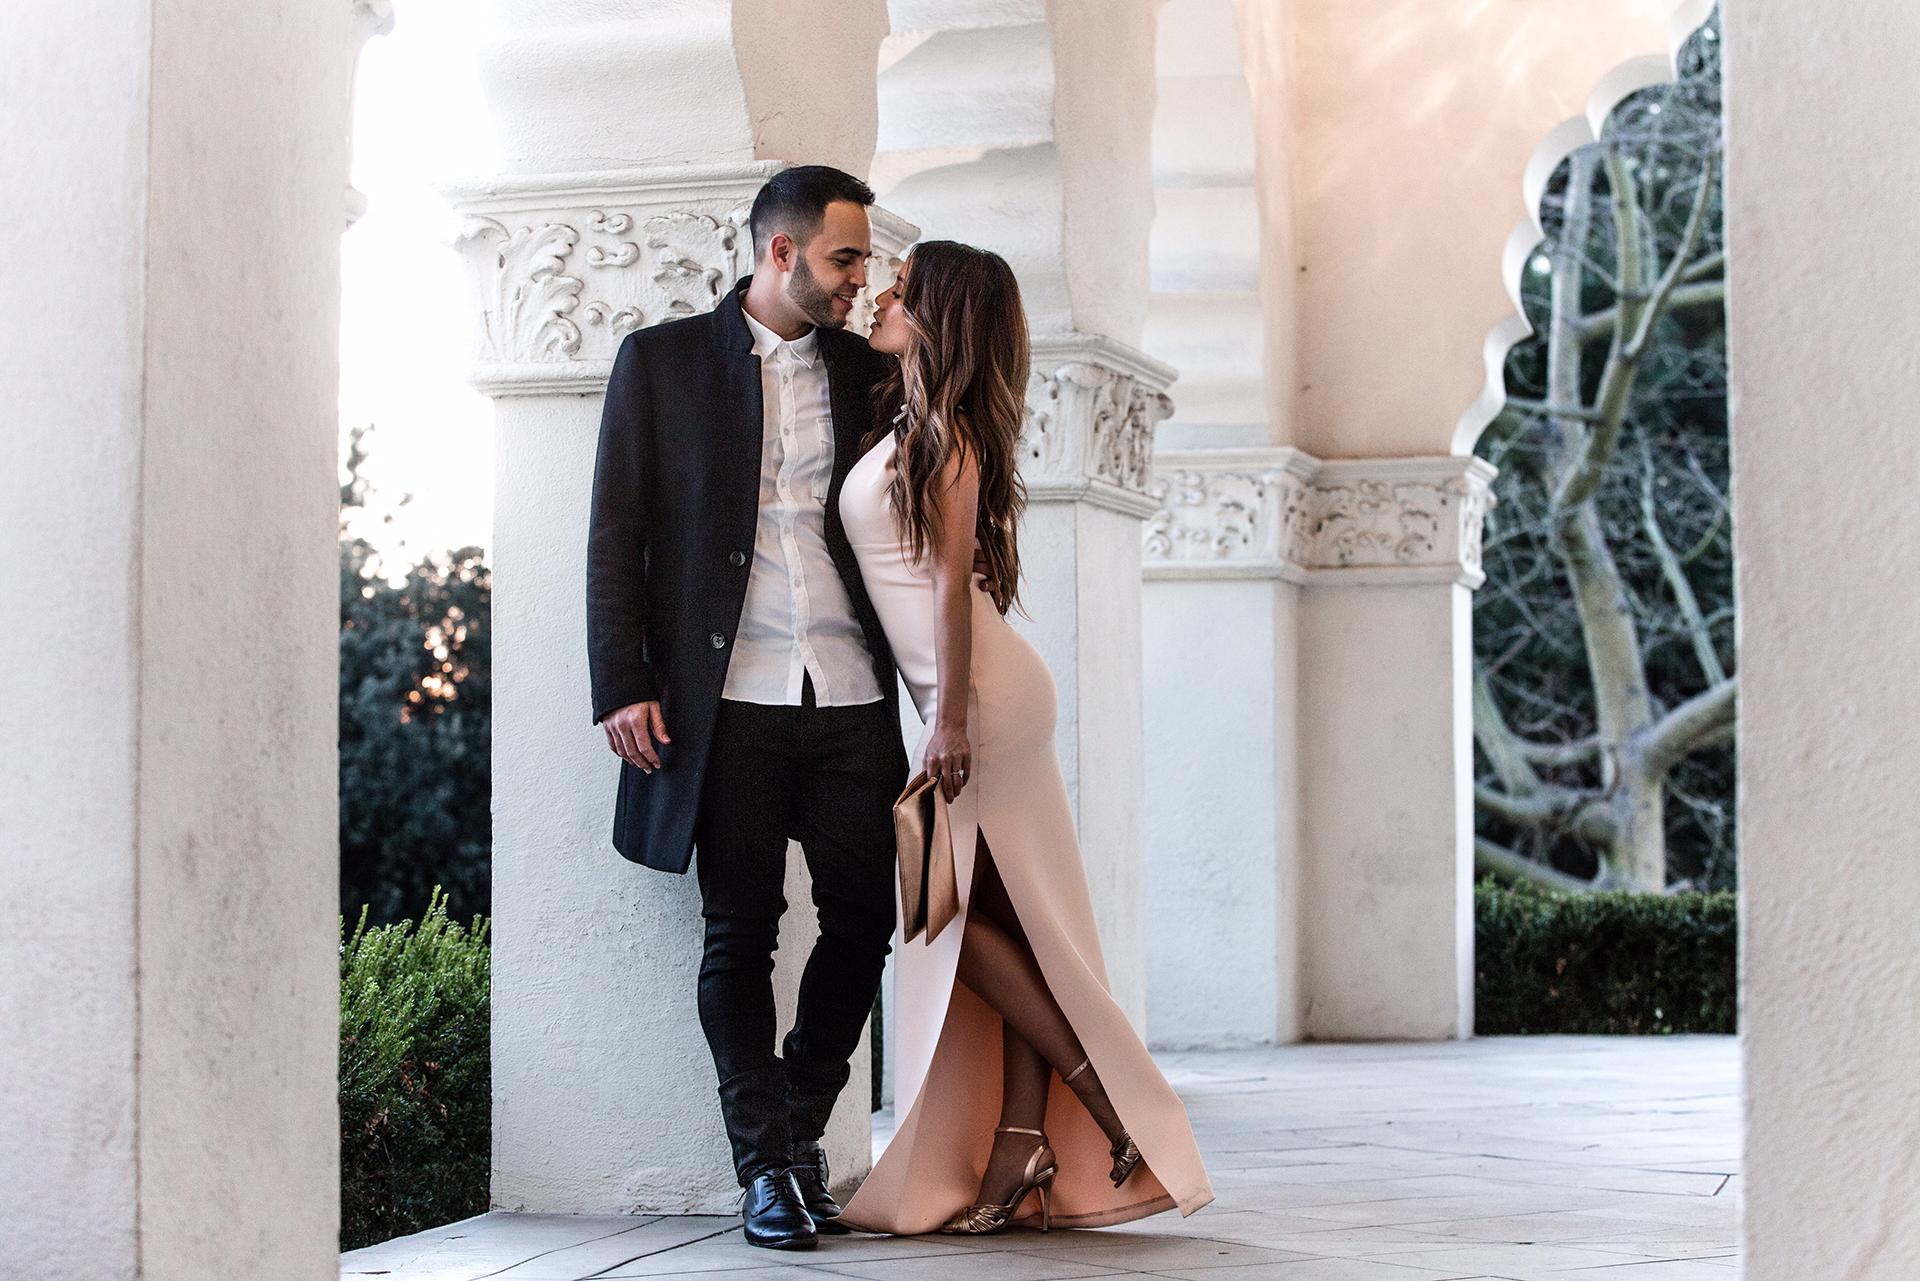 Jessi Malay and Husband